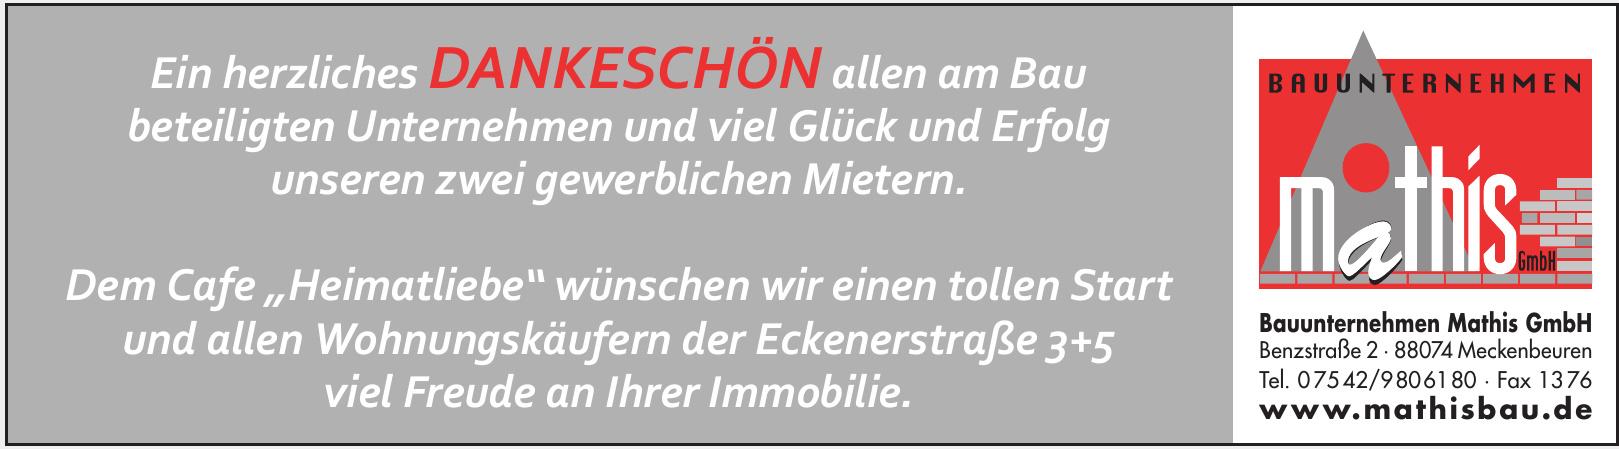 Bauunternehmen Mathis GmbH